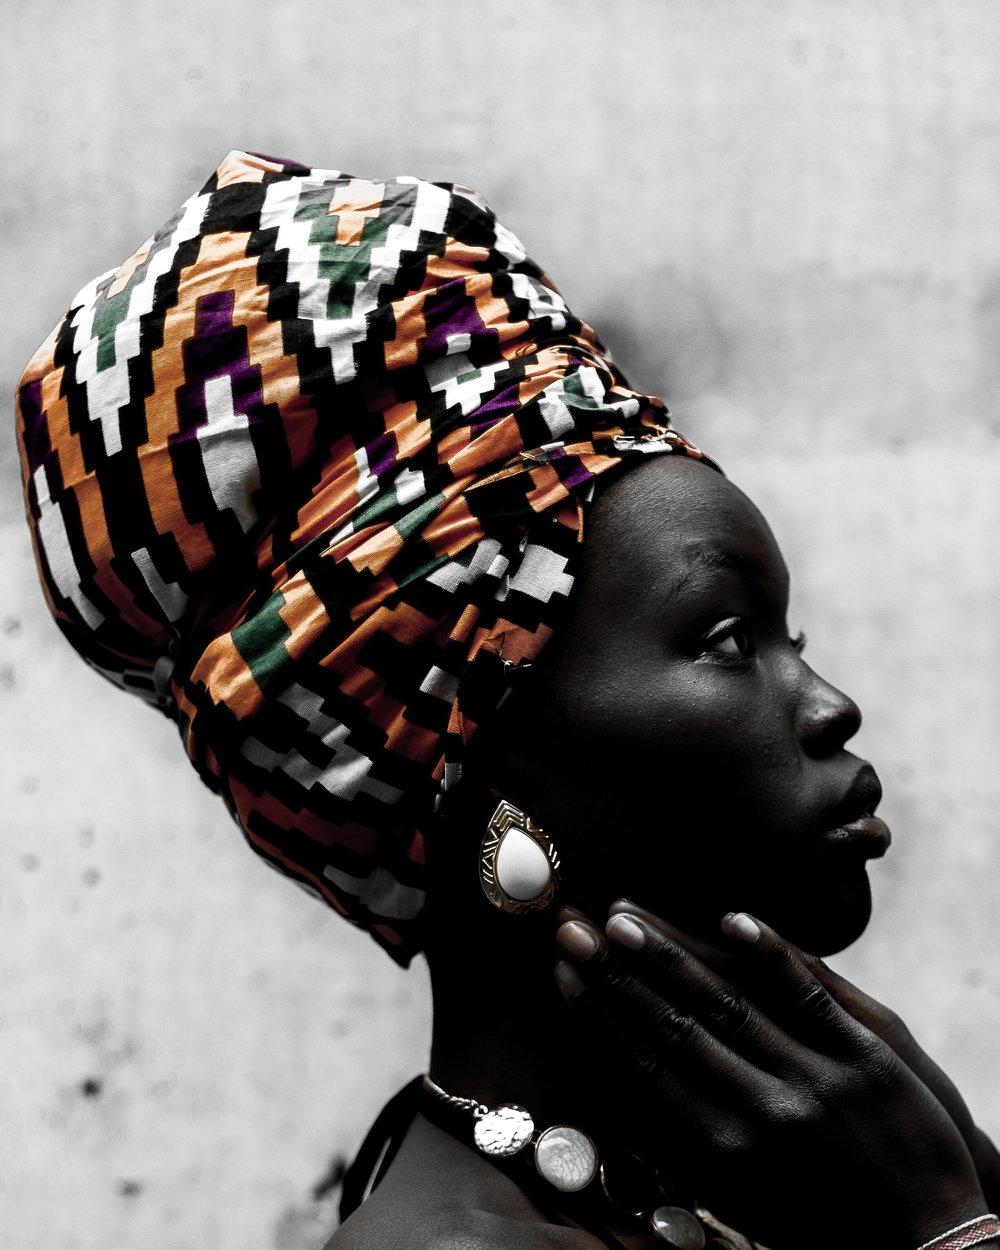 Photo Credt: Oladimeji Odunsi